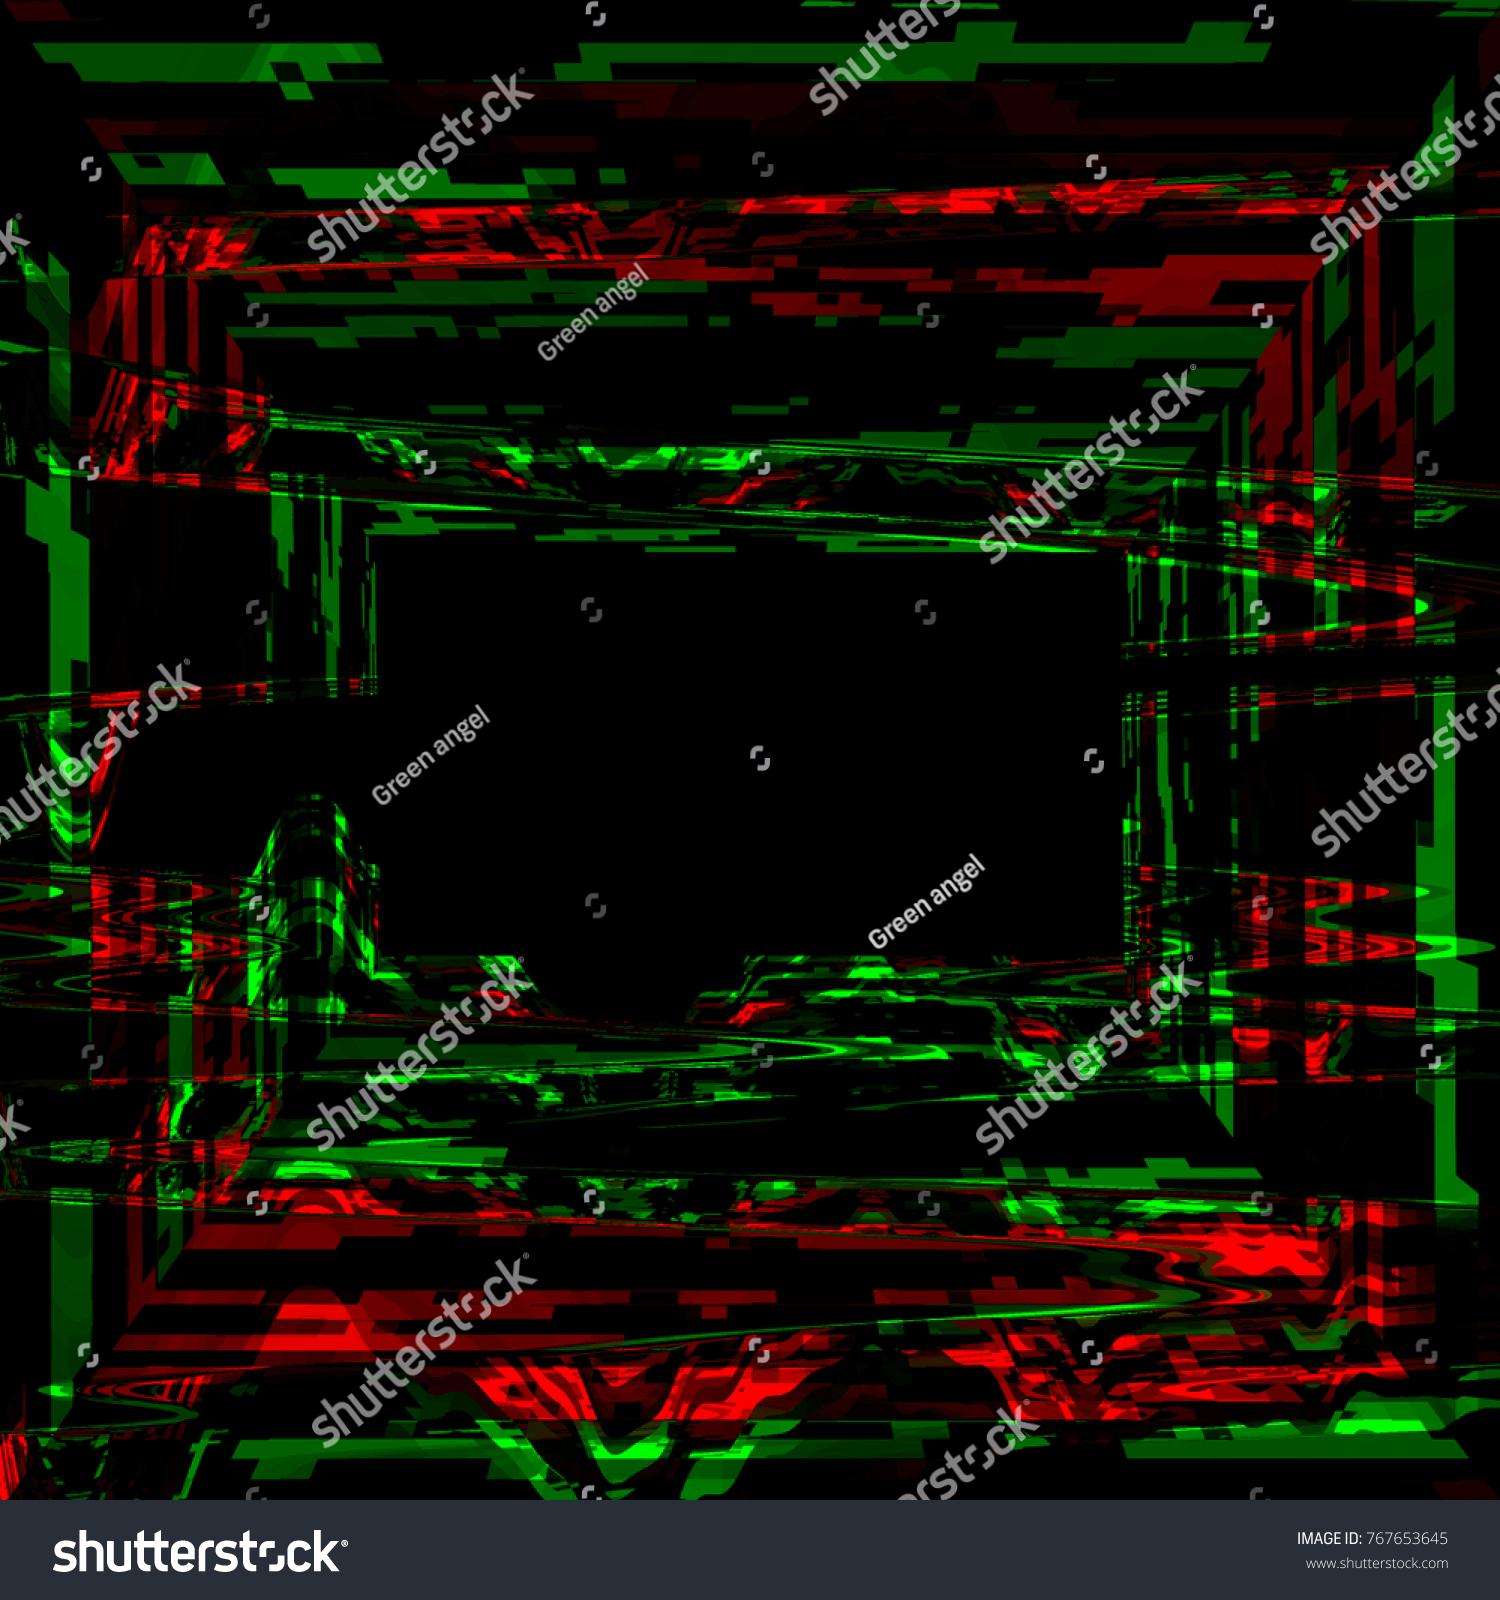 Sensational Glitch Psychedelic Background Cyber Room Digital Stock Download Free Architecture Designs Scobabritishbridgeorg